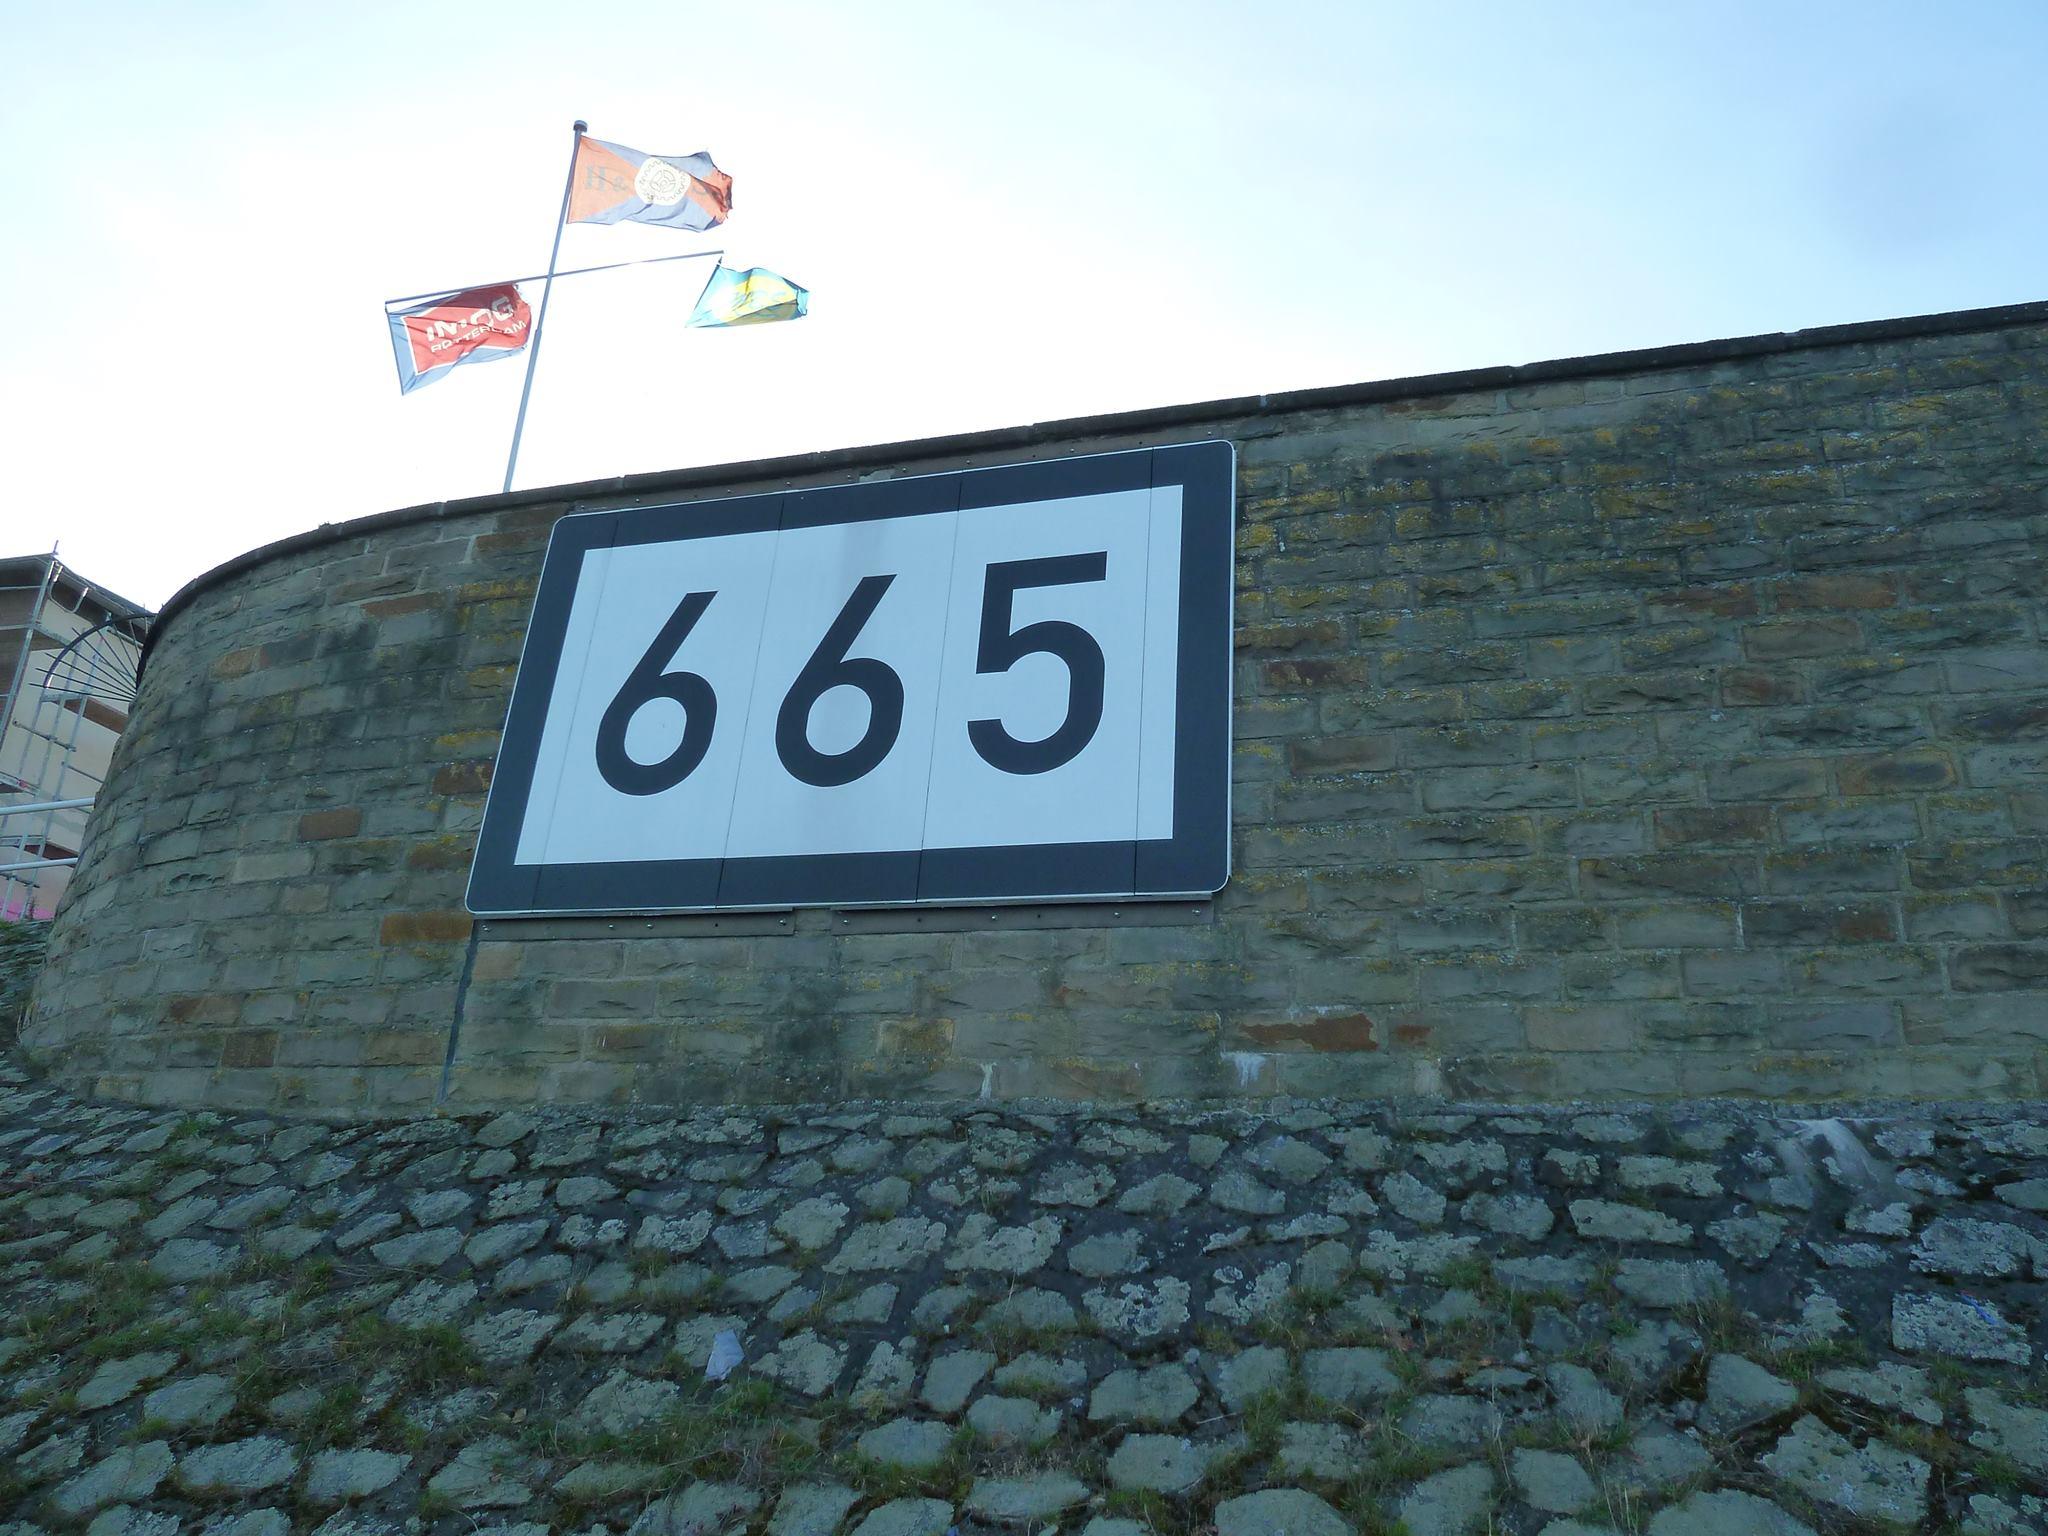 rheinkilometer-665-2